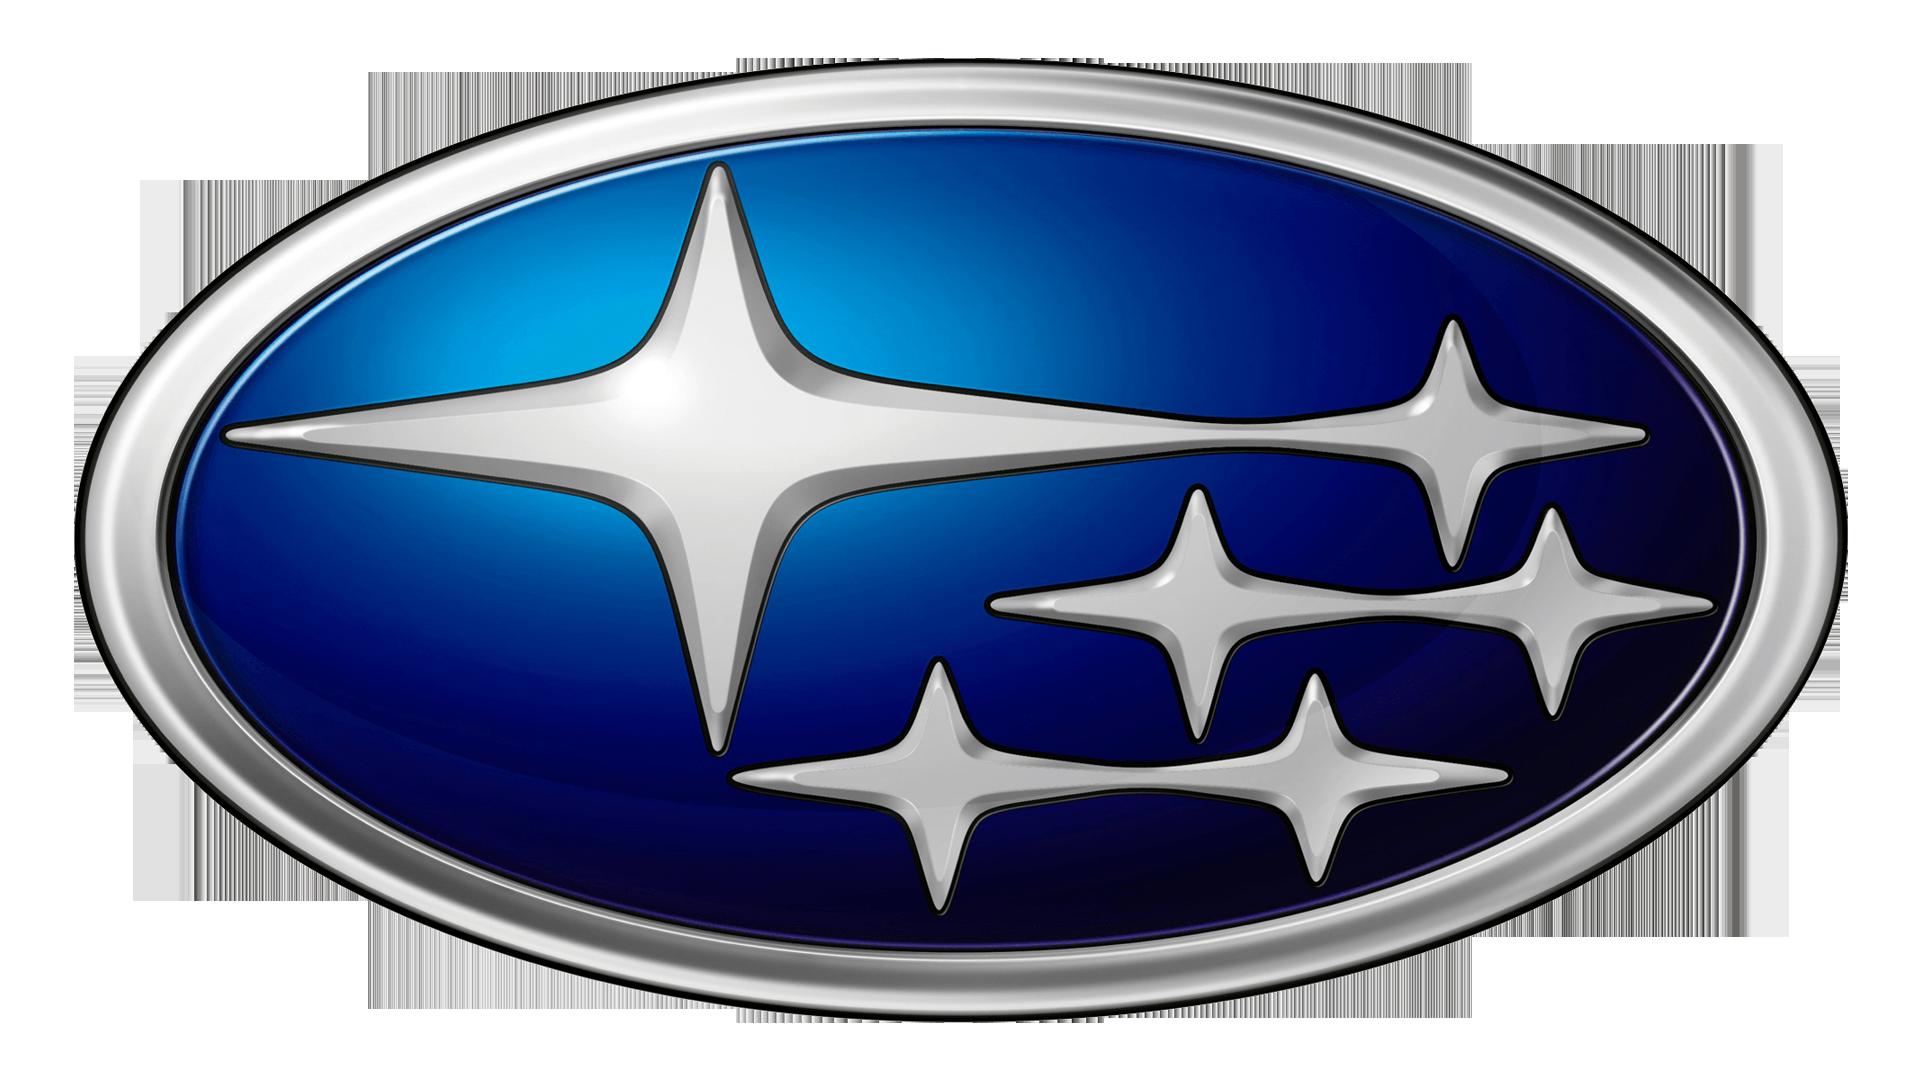 Meaning Subaru logo and symbol.